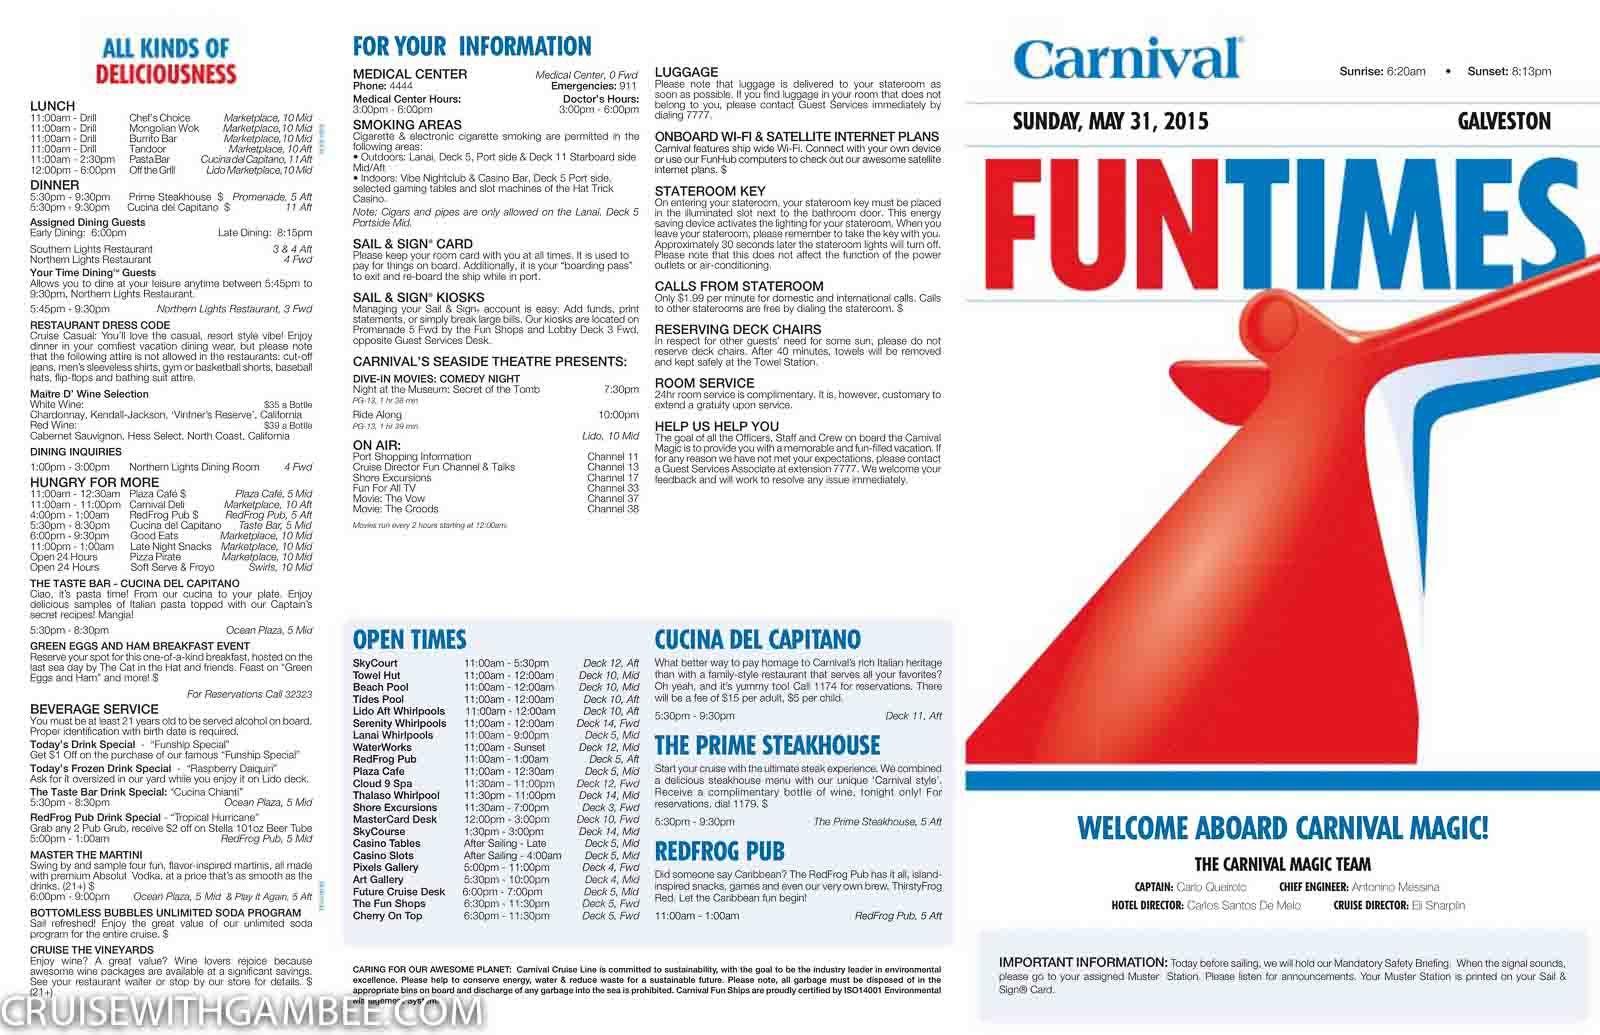 Carnival Magic Funtimes Daily Itinerary Carnival Magic Carnival